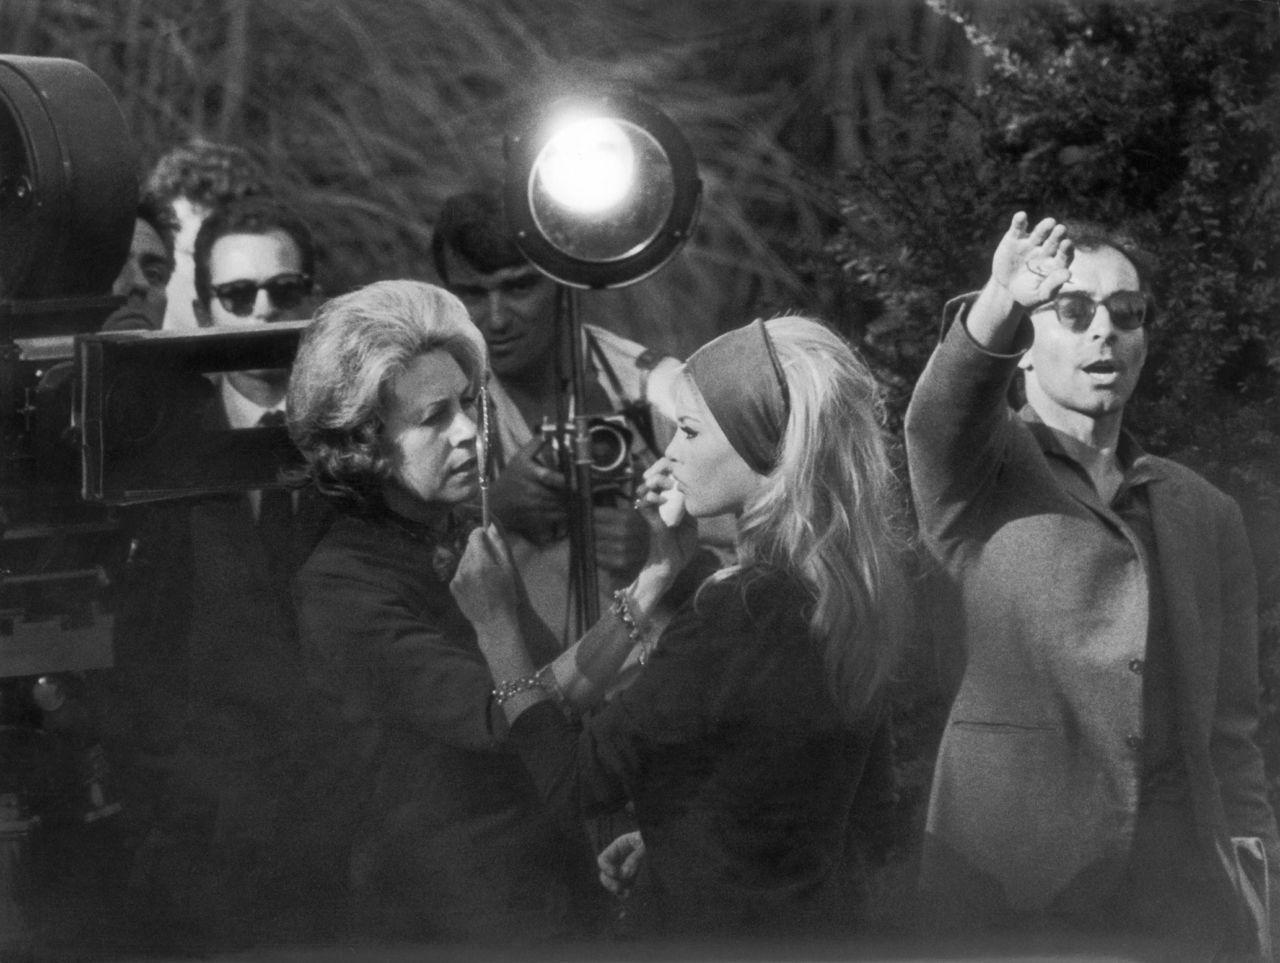 Brigitte Bardot, Jean-Luc Godard, and Raoul Coutard in Le mépris (1963)